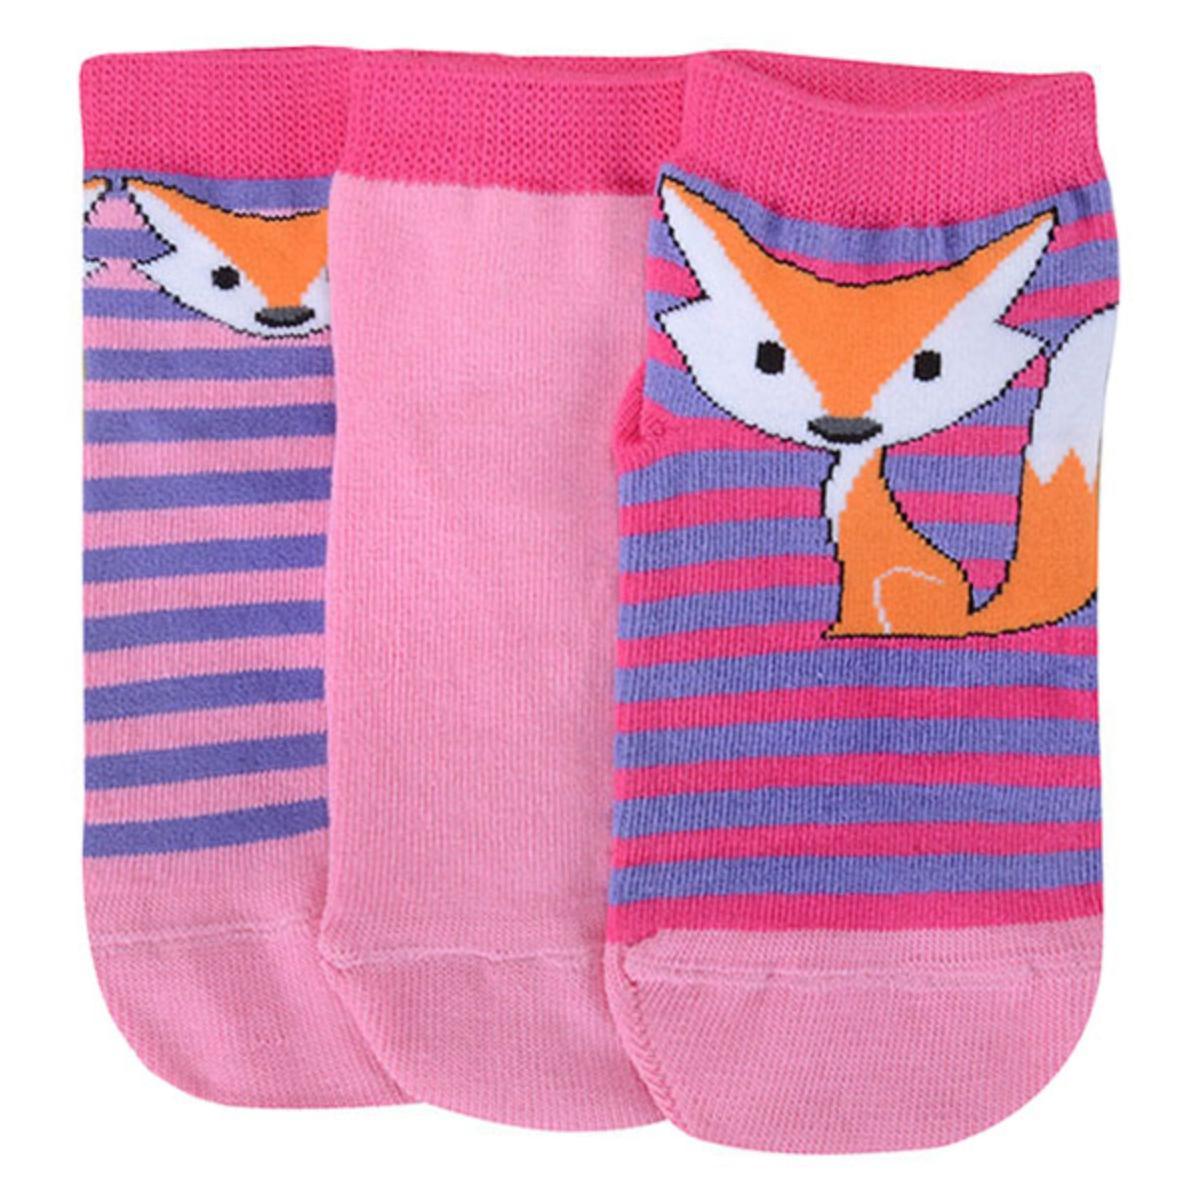 Meia Fem Infantil Lupo 02678 089 0931 Pink/rosa Listrado